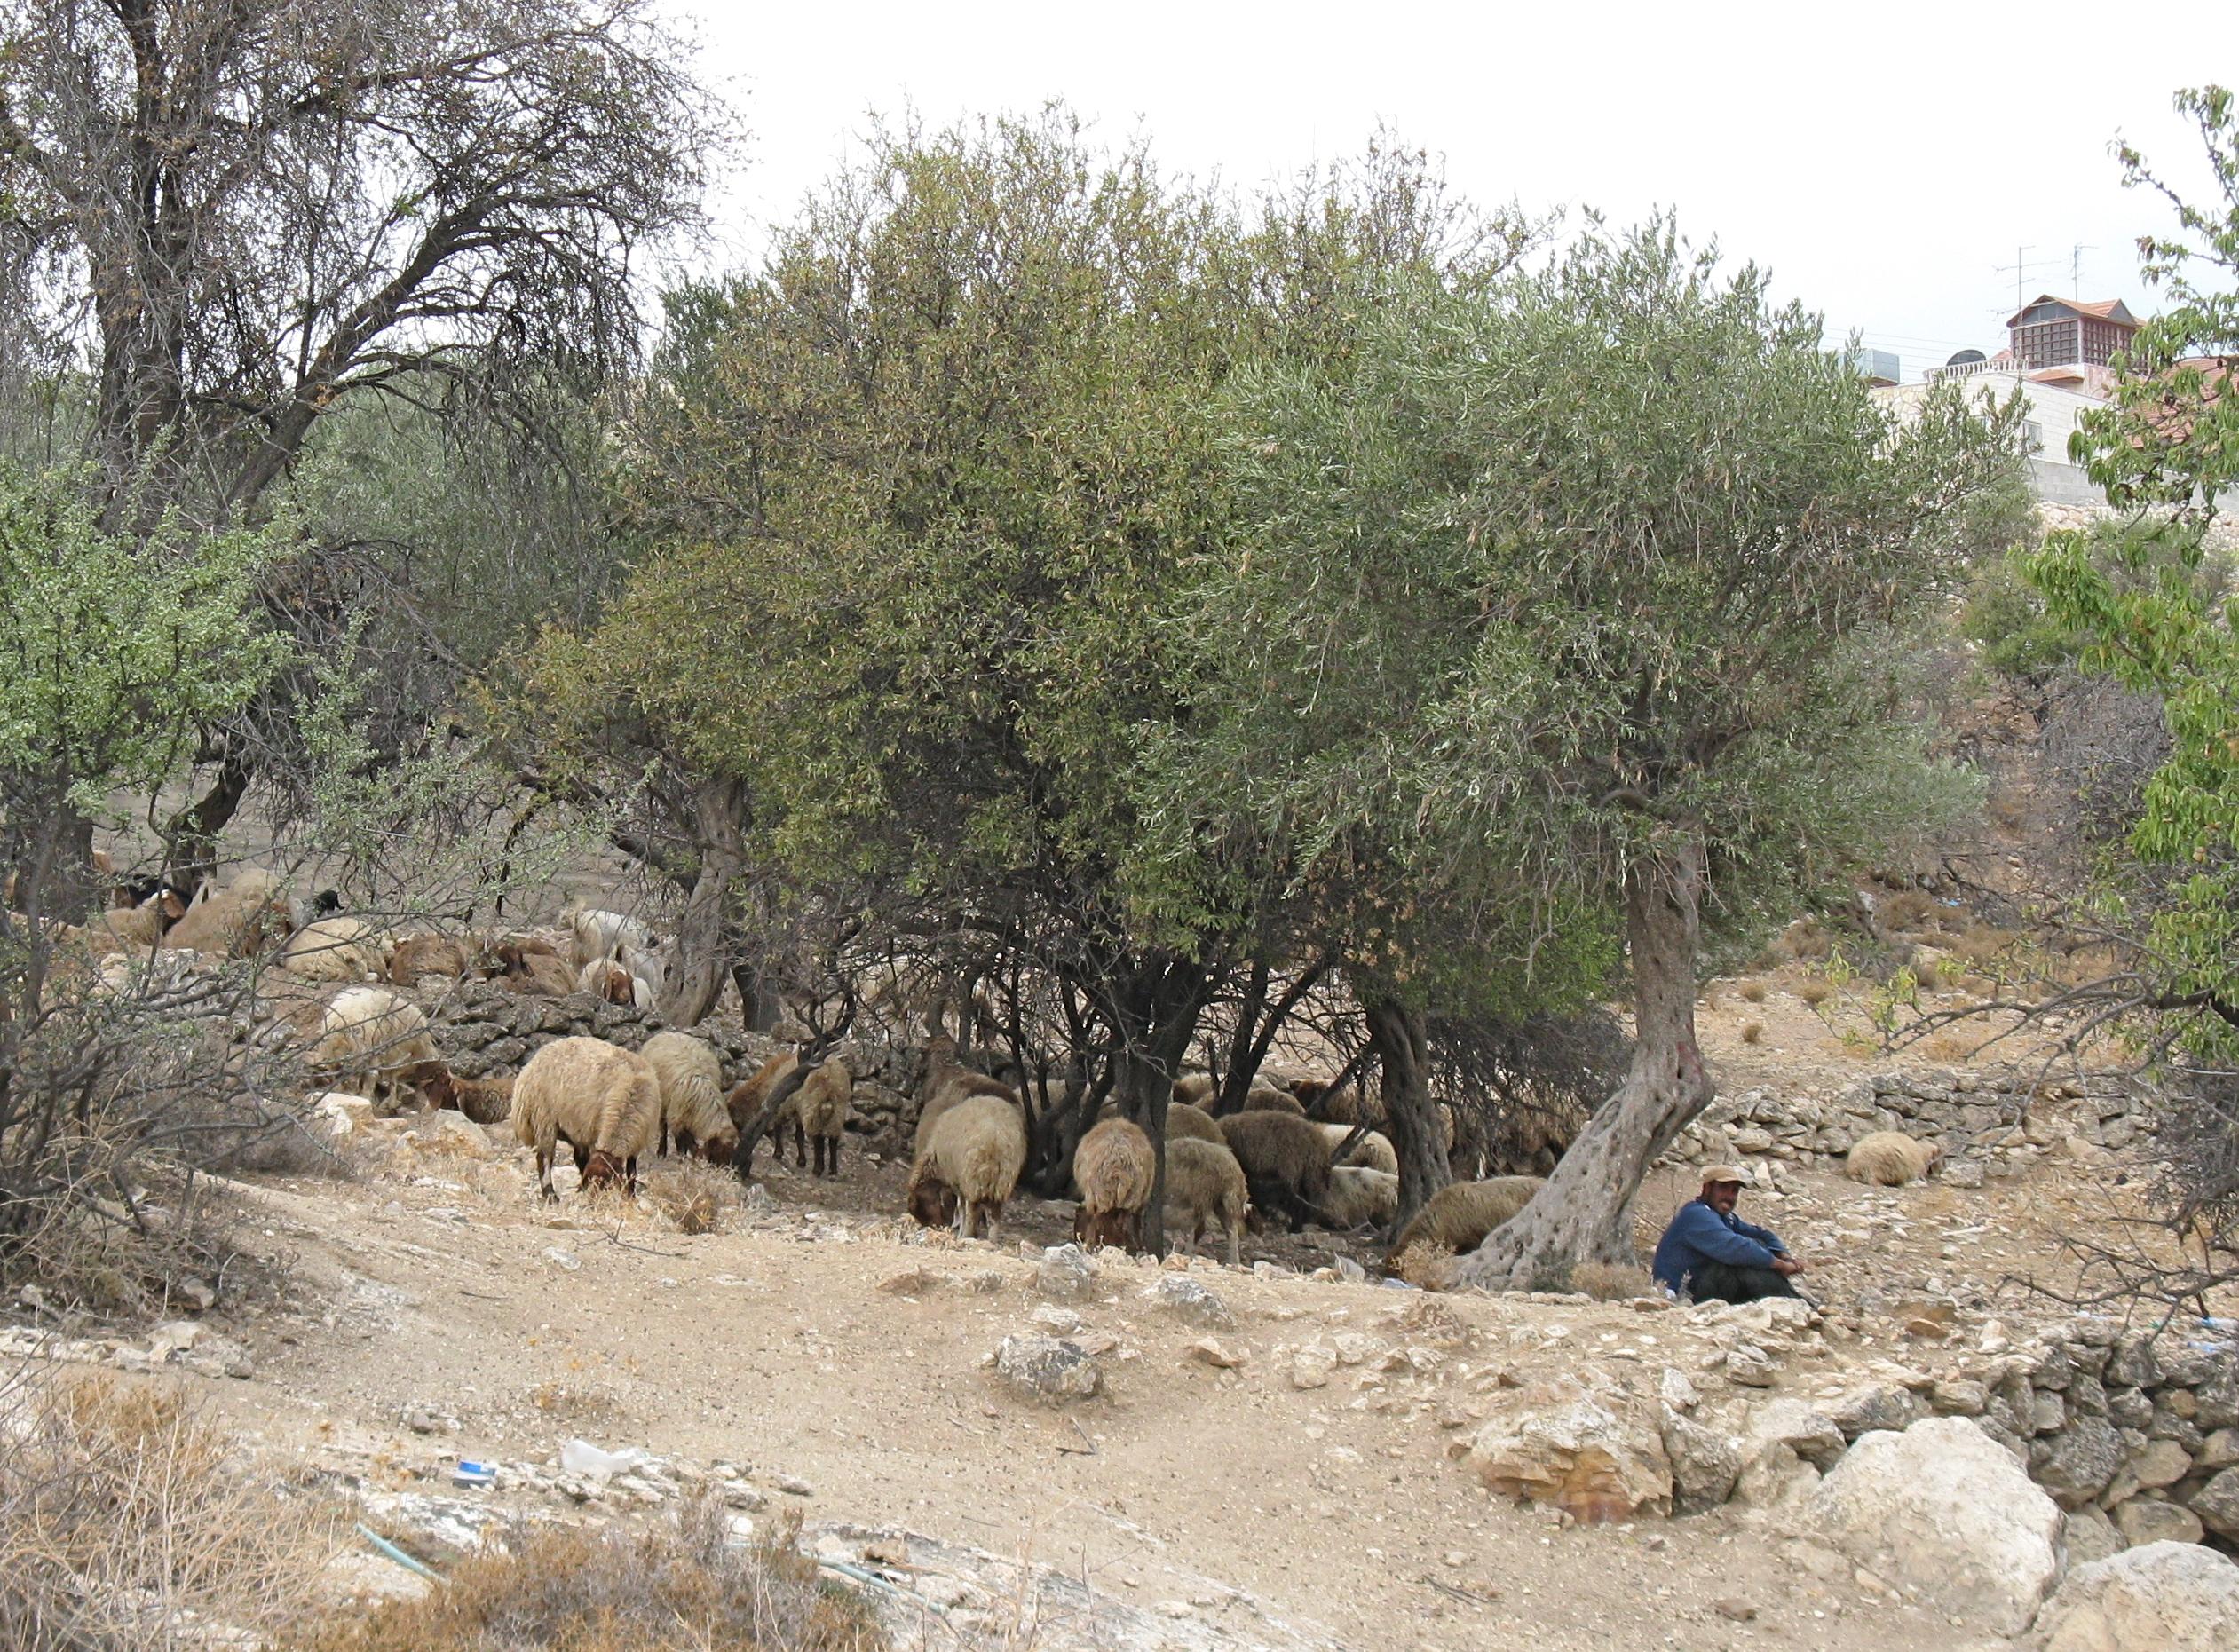 Shepherd with sheep in Beit Sahour